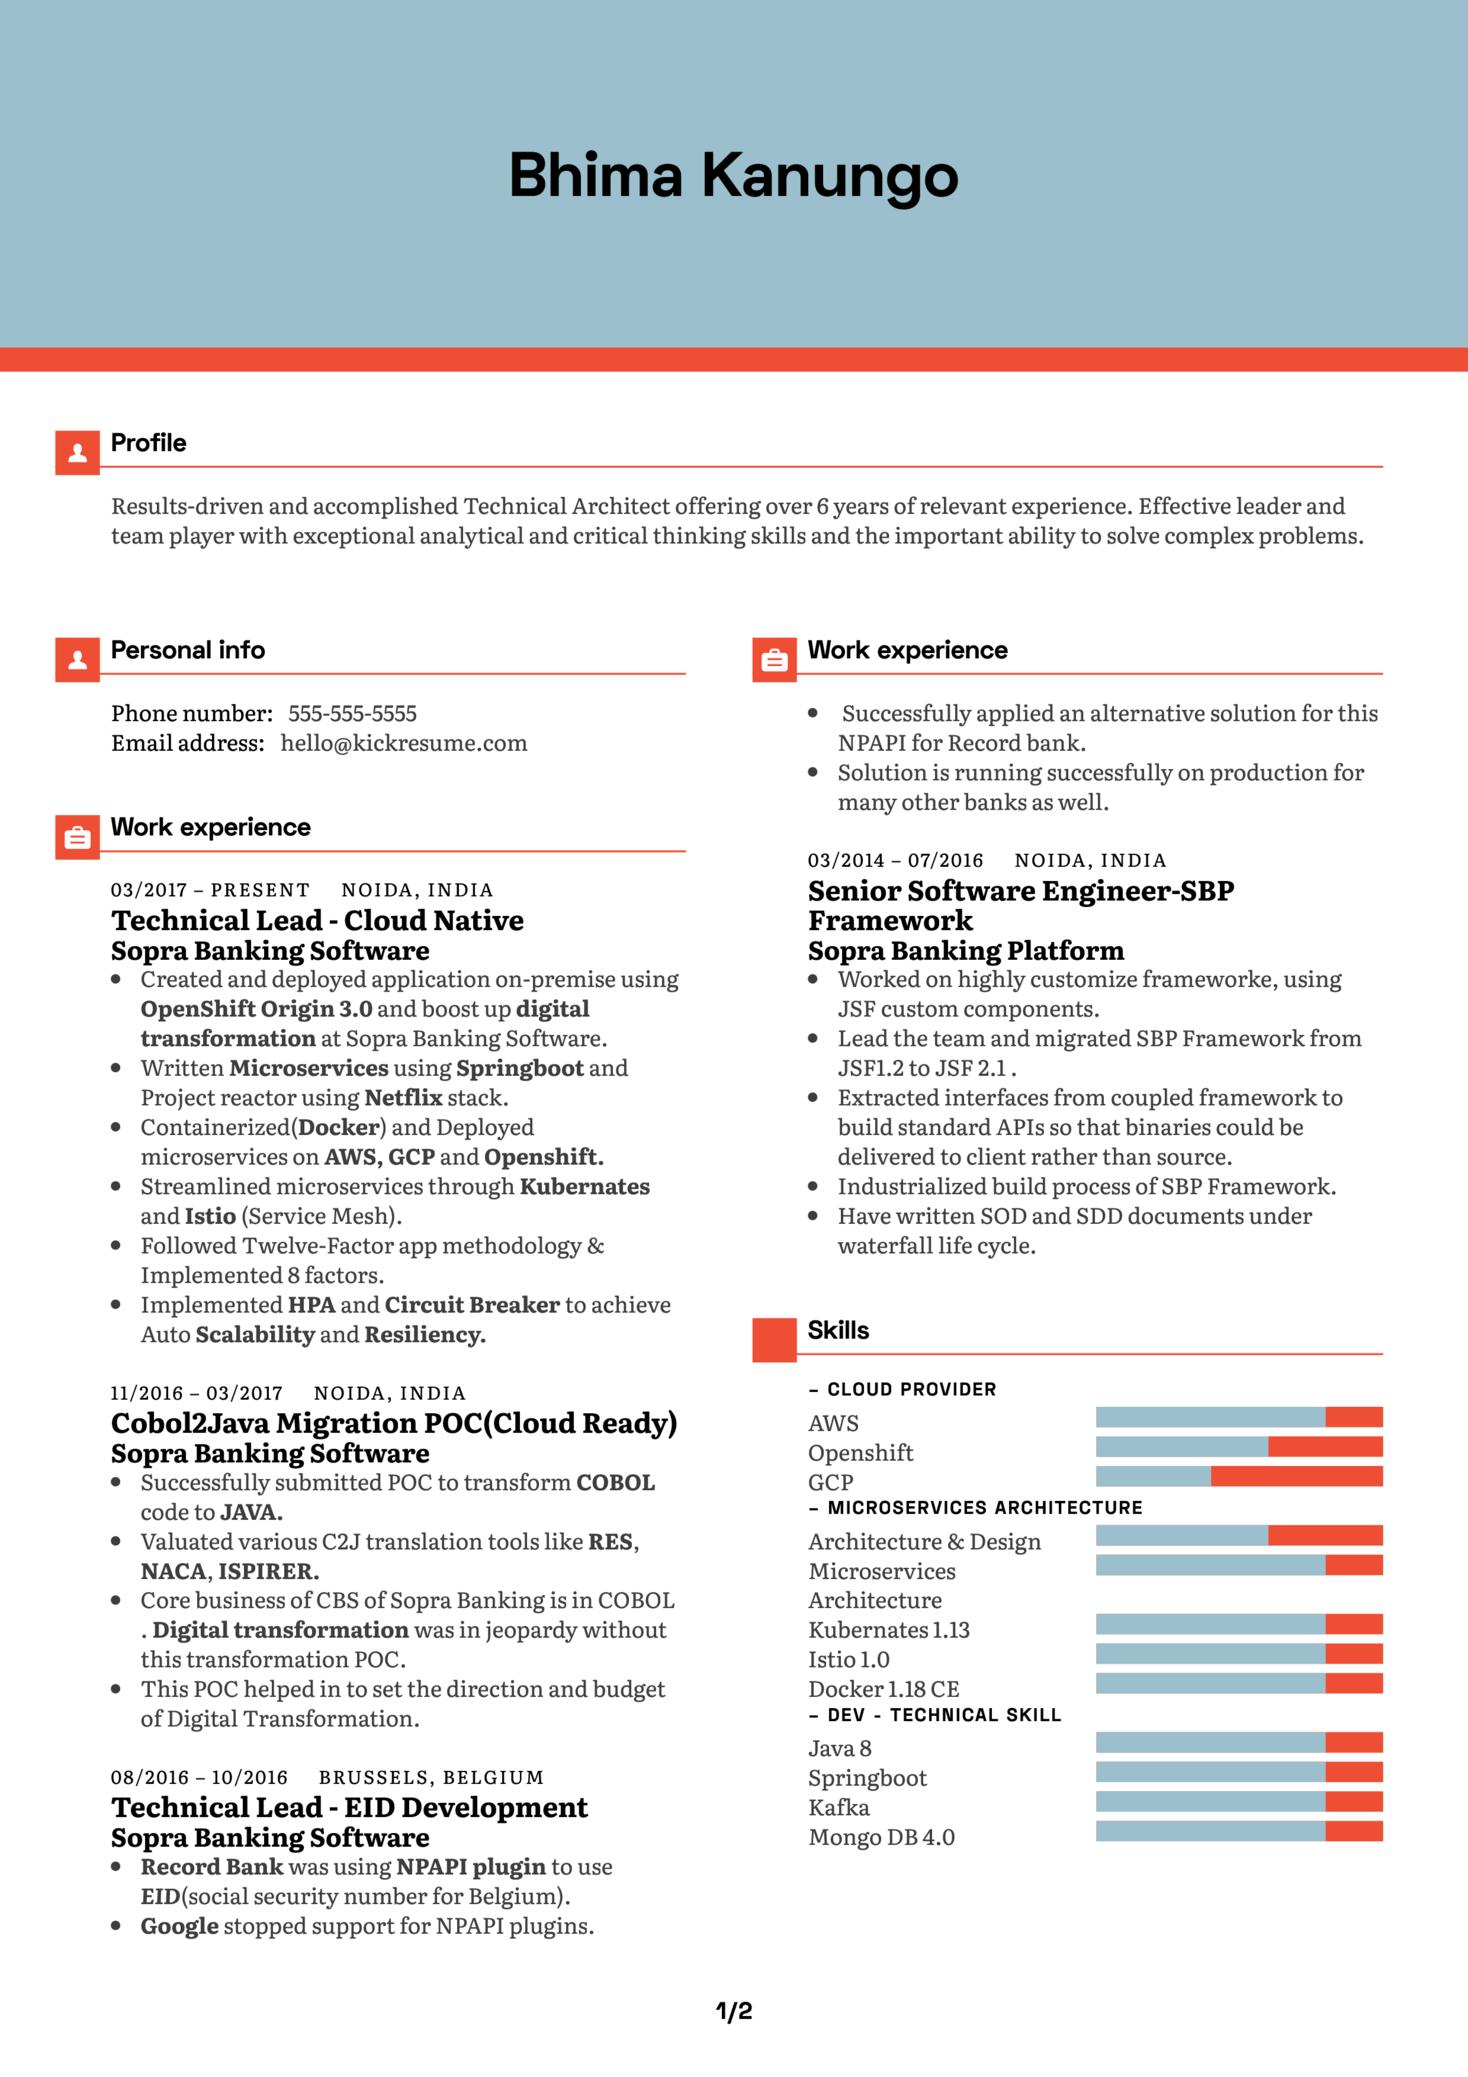 ImpetusTechnical Architect Resume Example (Part 1)